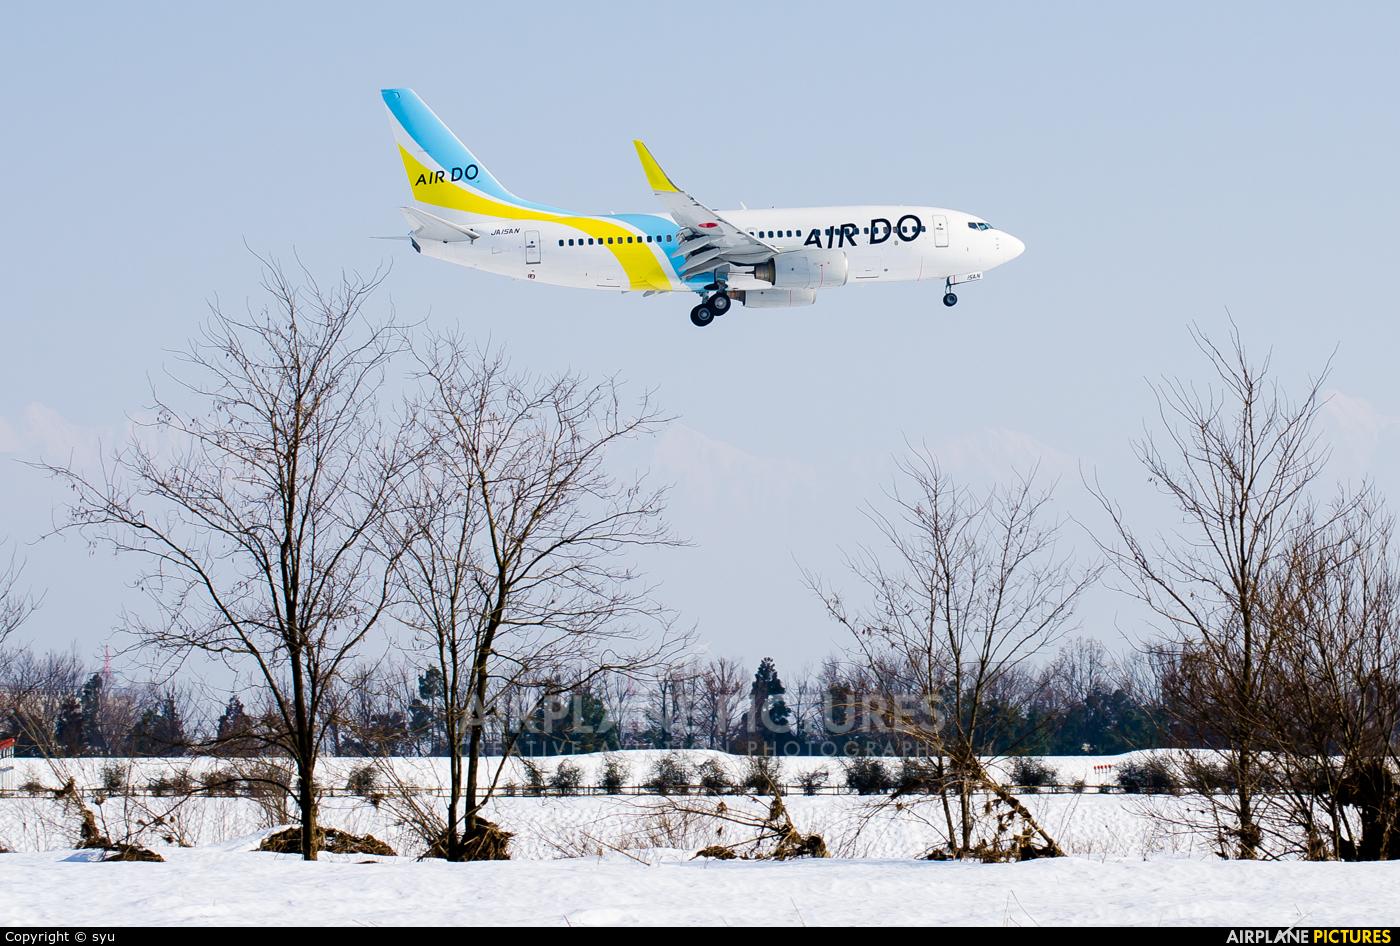 Air Do - Hokkaido International Airlines JA15AN aircraft at Toyama